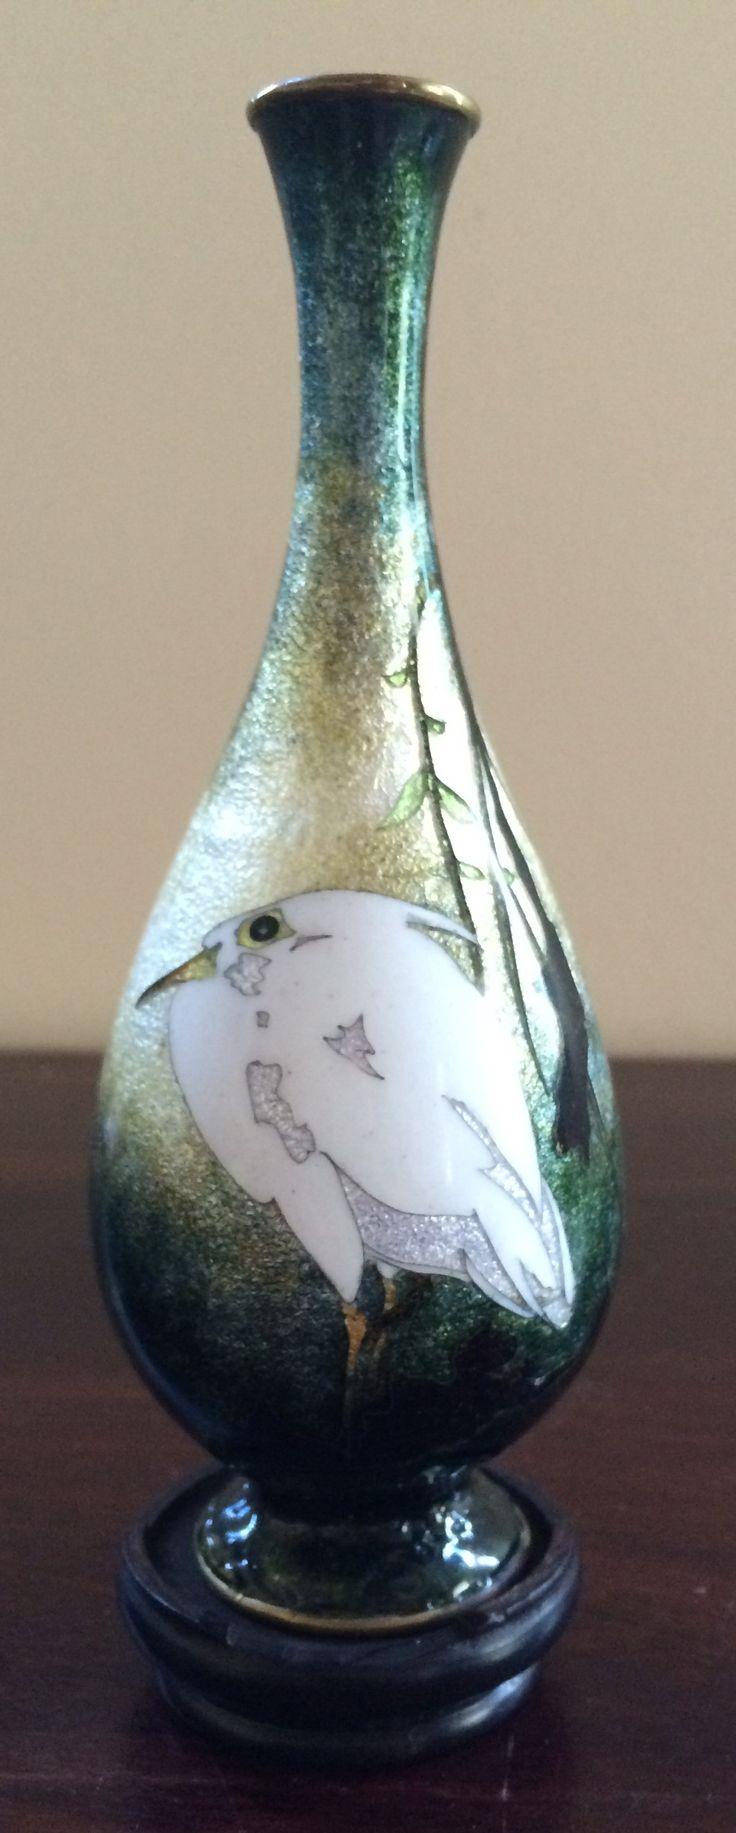 10 best japanese cloisonne images on pinterest vase enamels and japanese cloisonn vase in nagare gusuru flambflowing enamels by hattori tadasaburo reviewsmspy